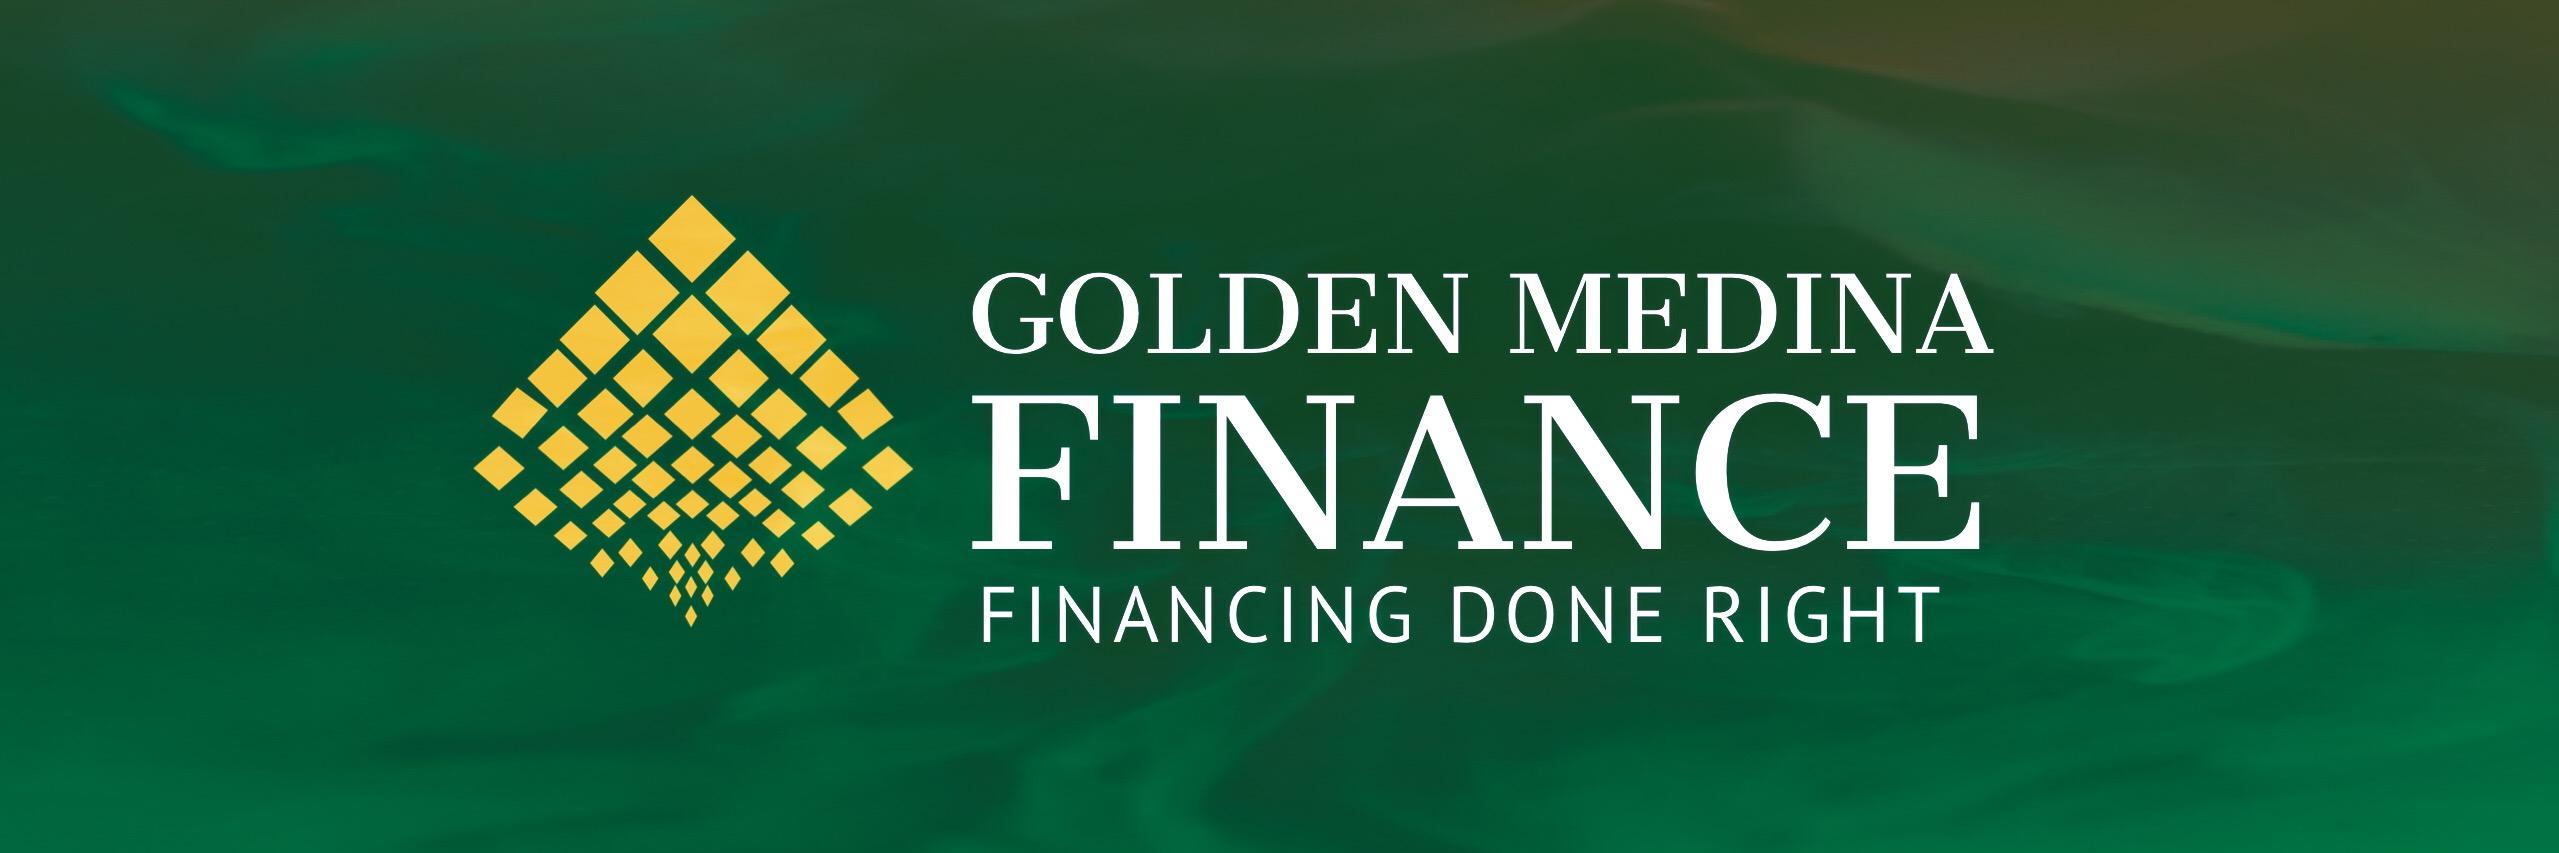 Golden Medina Finance - Financing Done Right